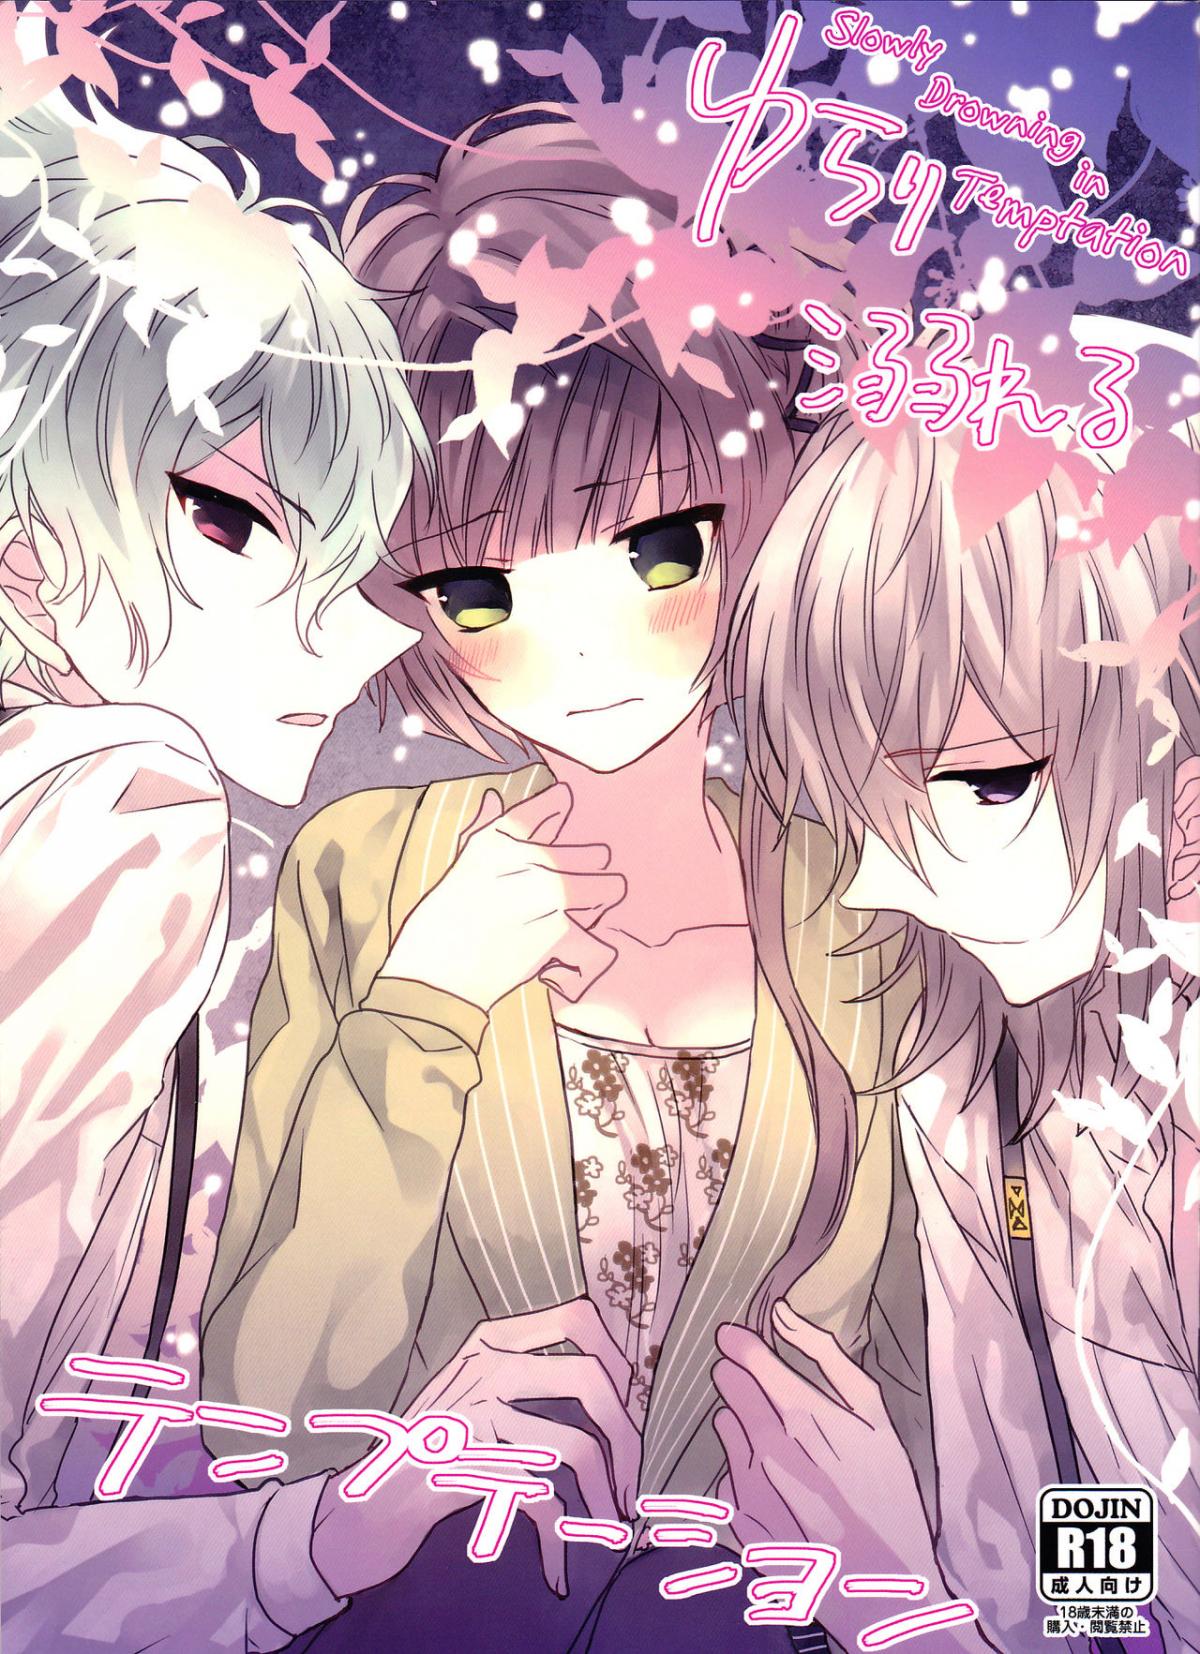 HentaiVN.net - Ảnh 2 - Yurari Oboreru Temptation (Collar x Malice) - Oneshot